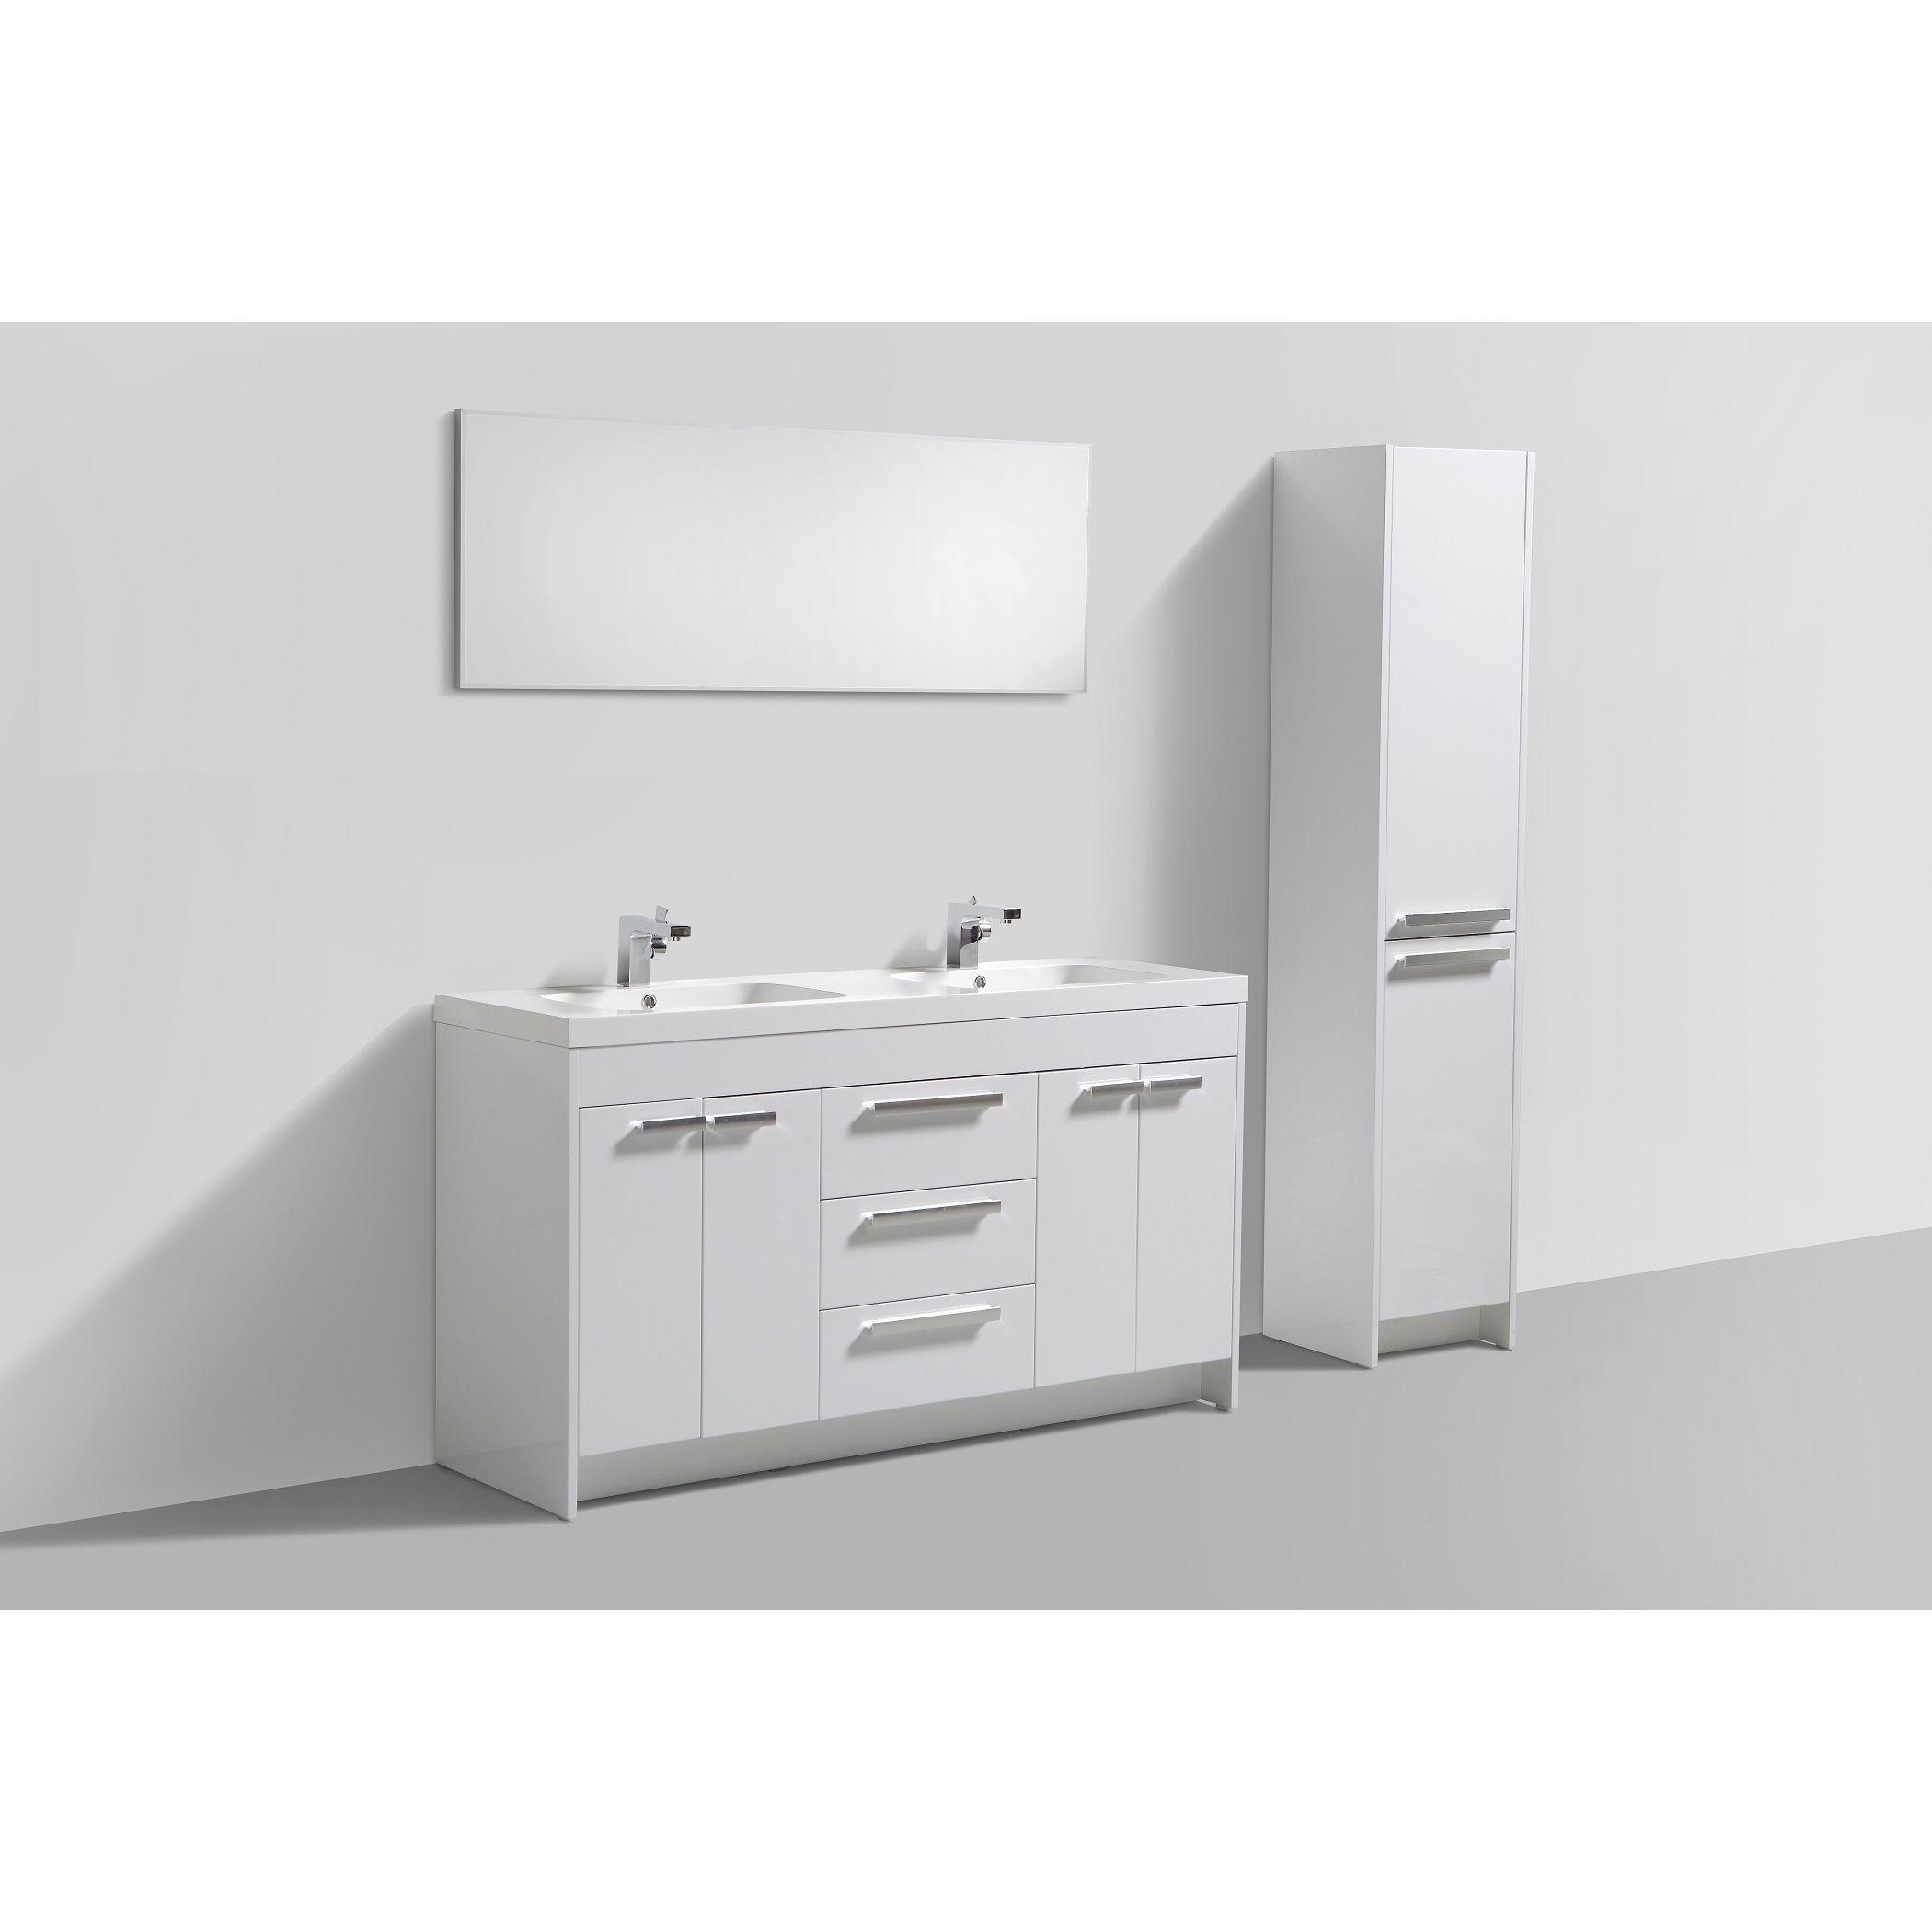 Eviva lugano inch white modern bathroom vanity with white